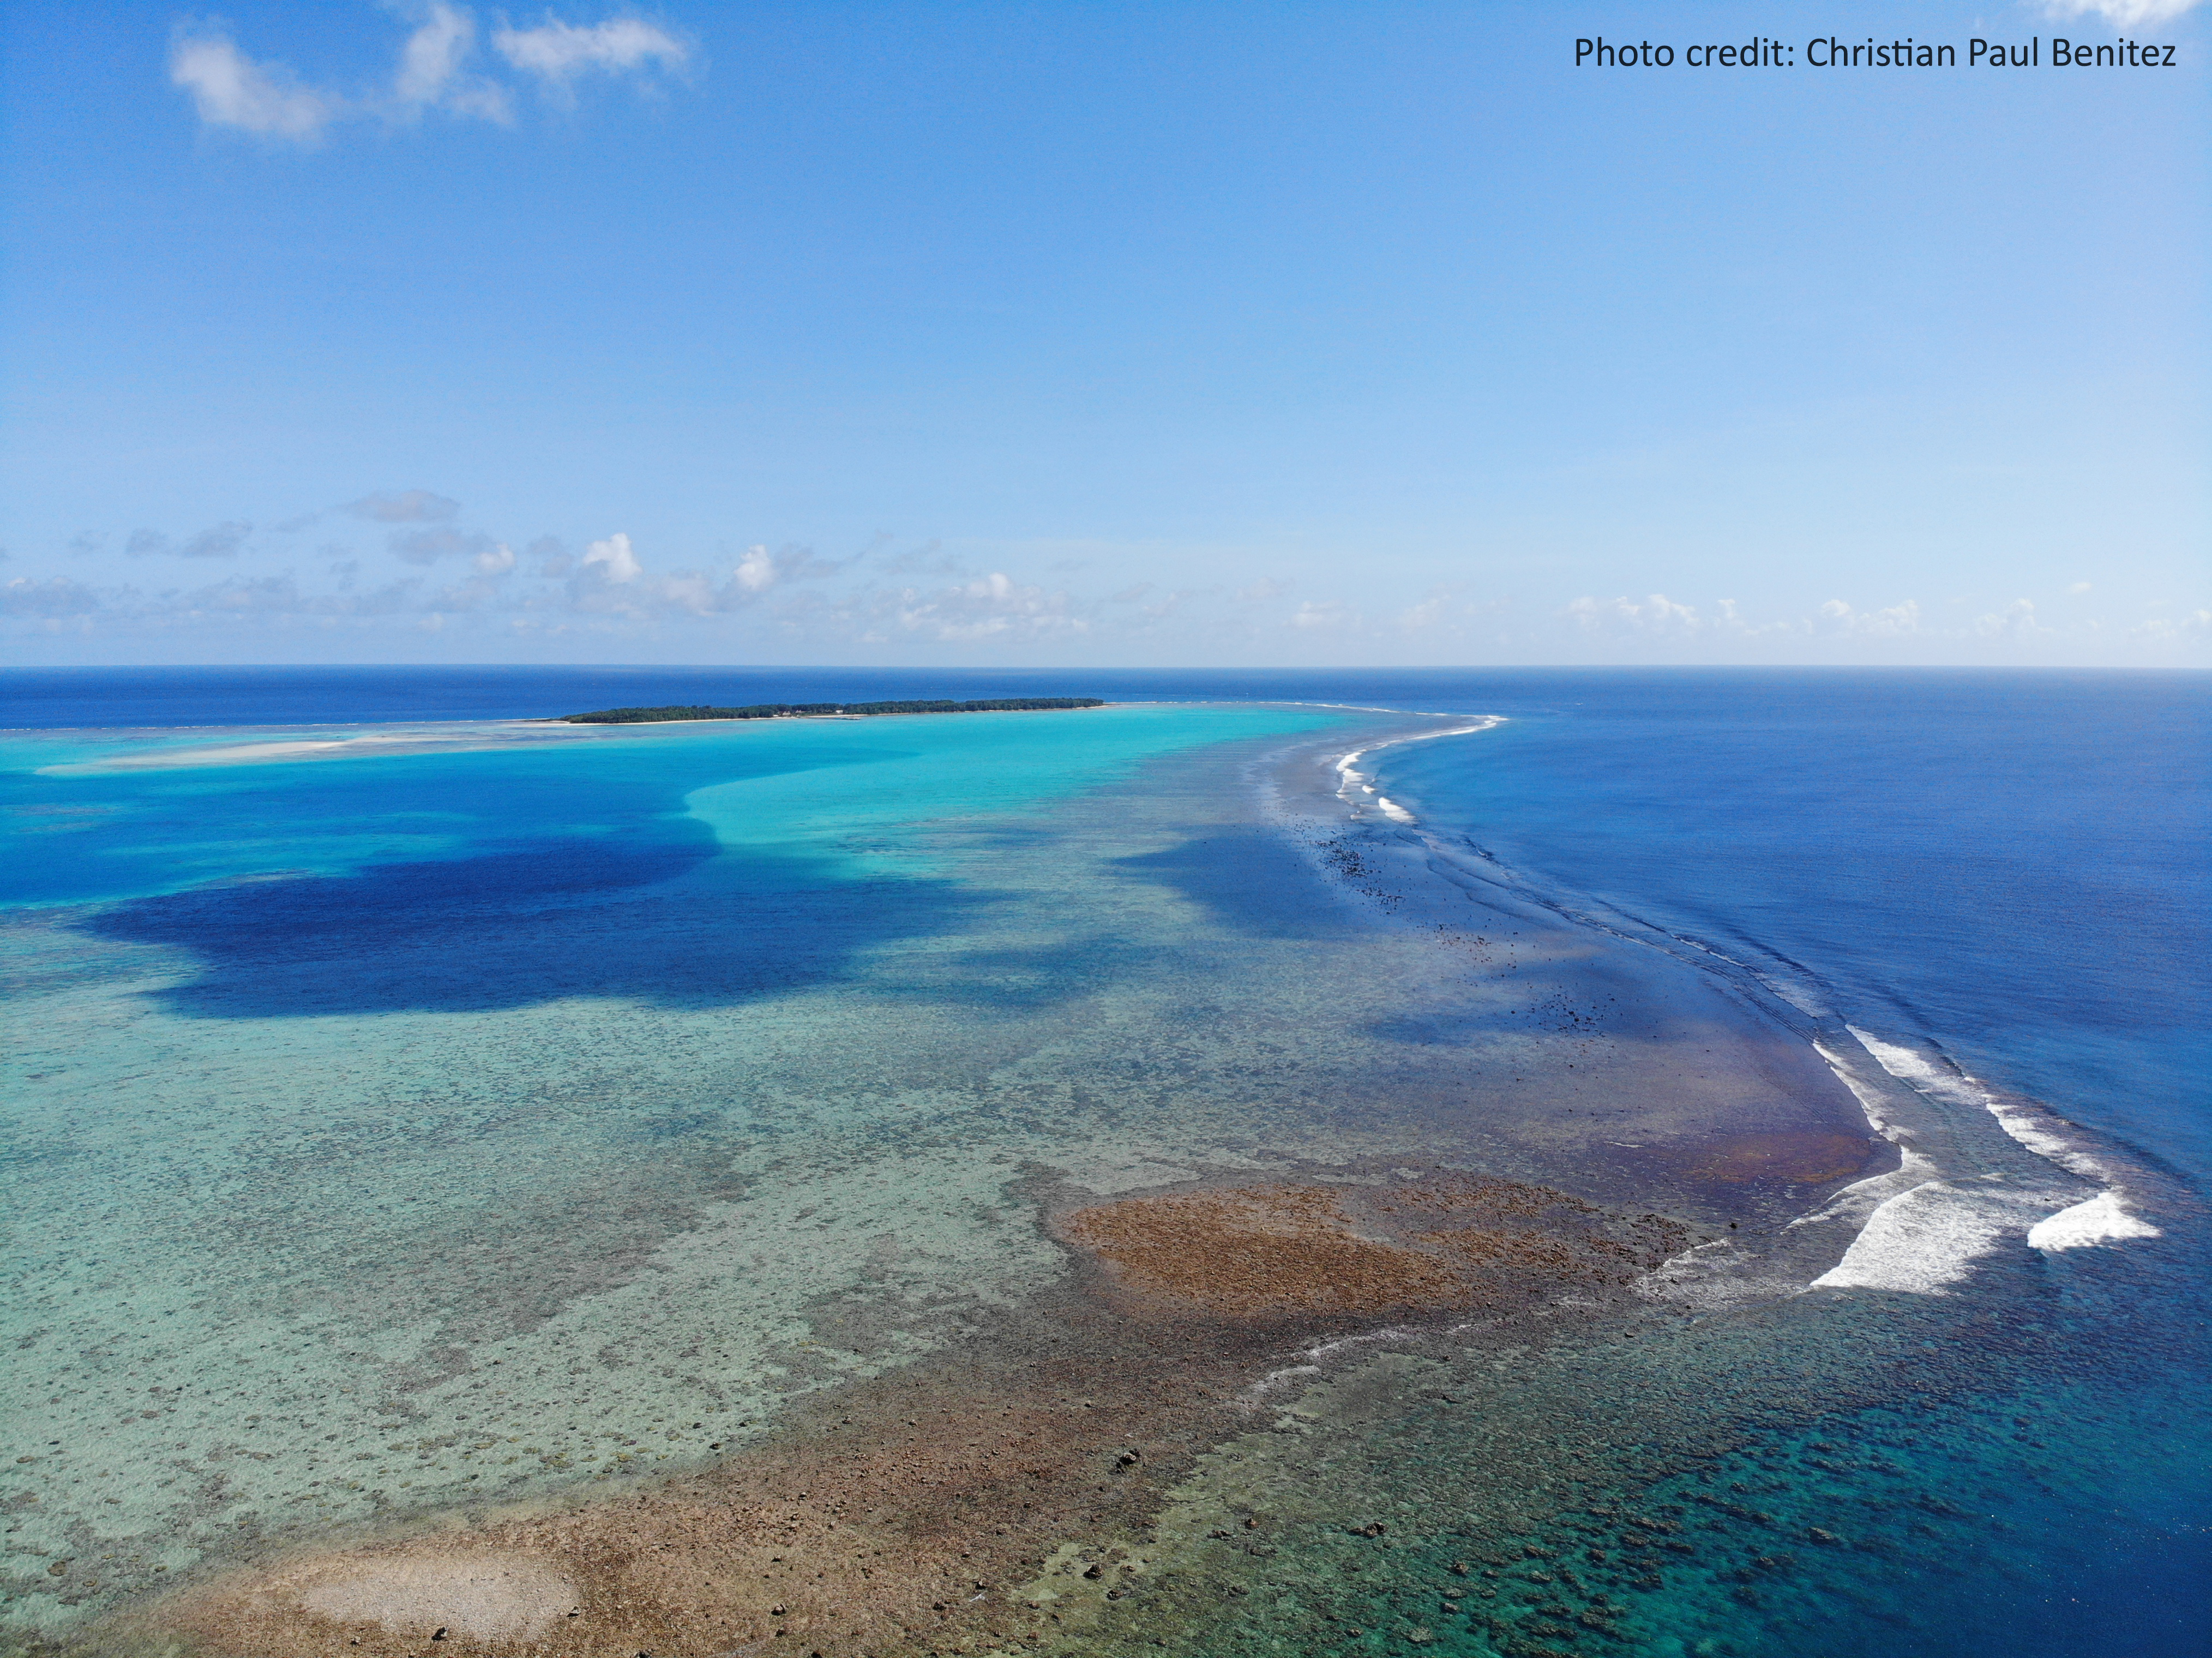 Cocos Island and lagoon from Merizo Village, Guam